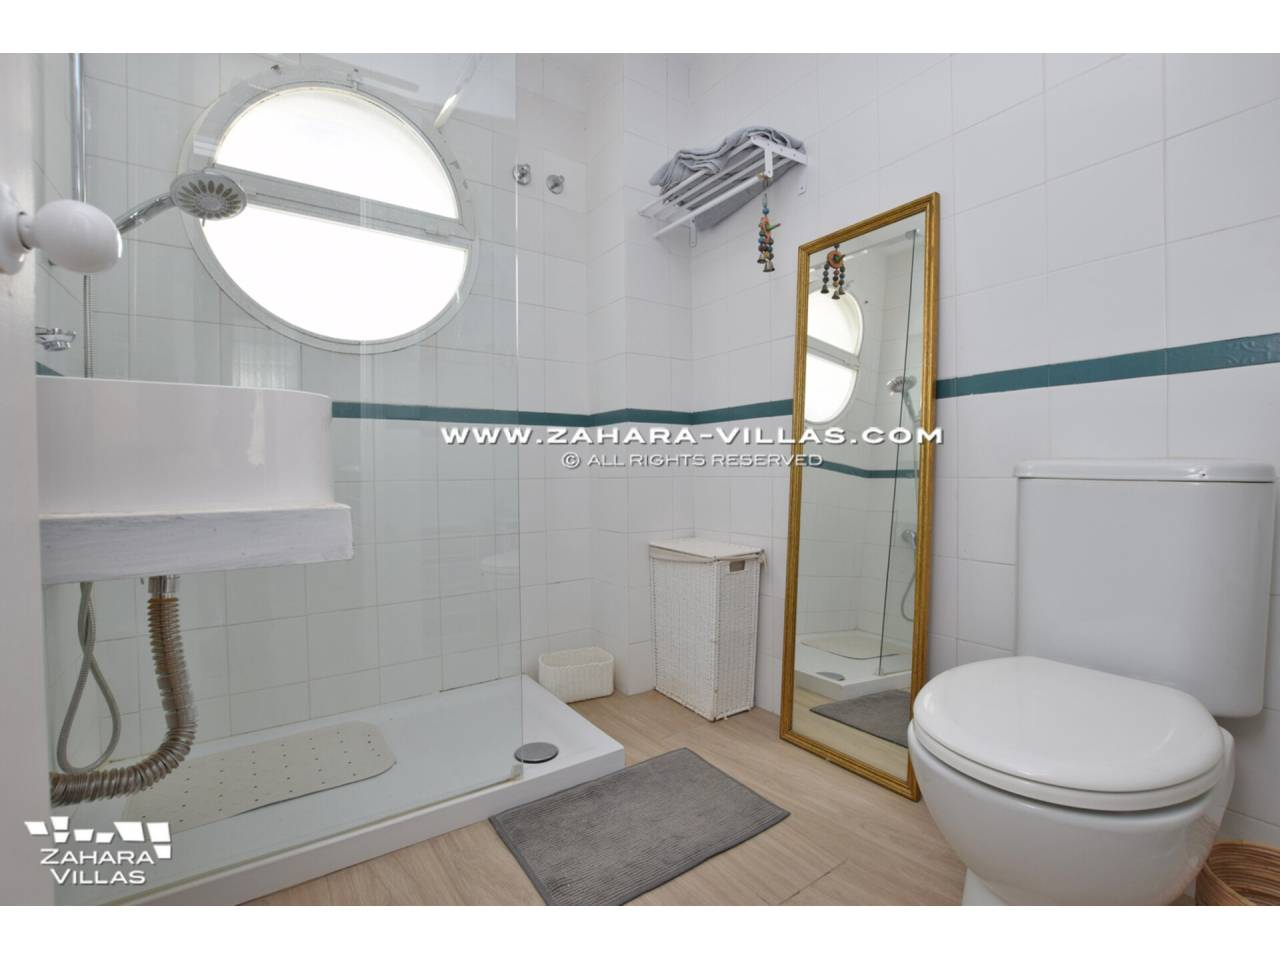 Imagen 30 de House for sale close to the beach, with sea views in Zahara de los Atunes